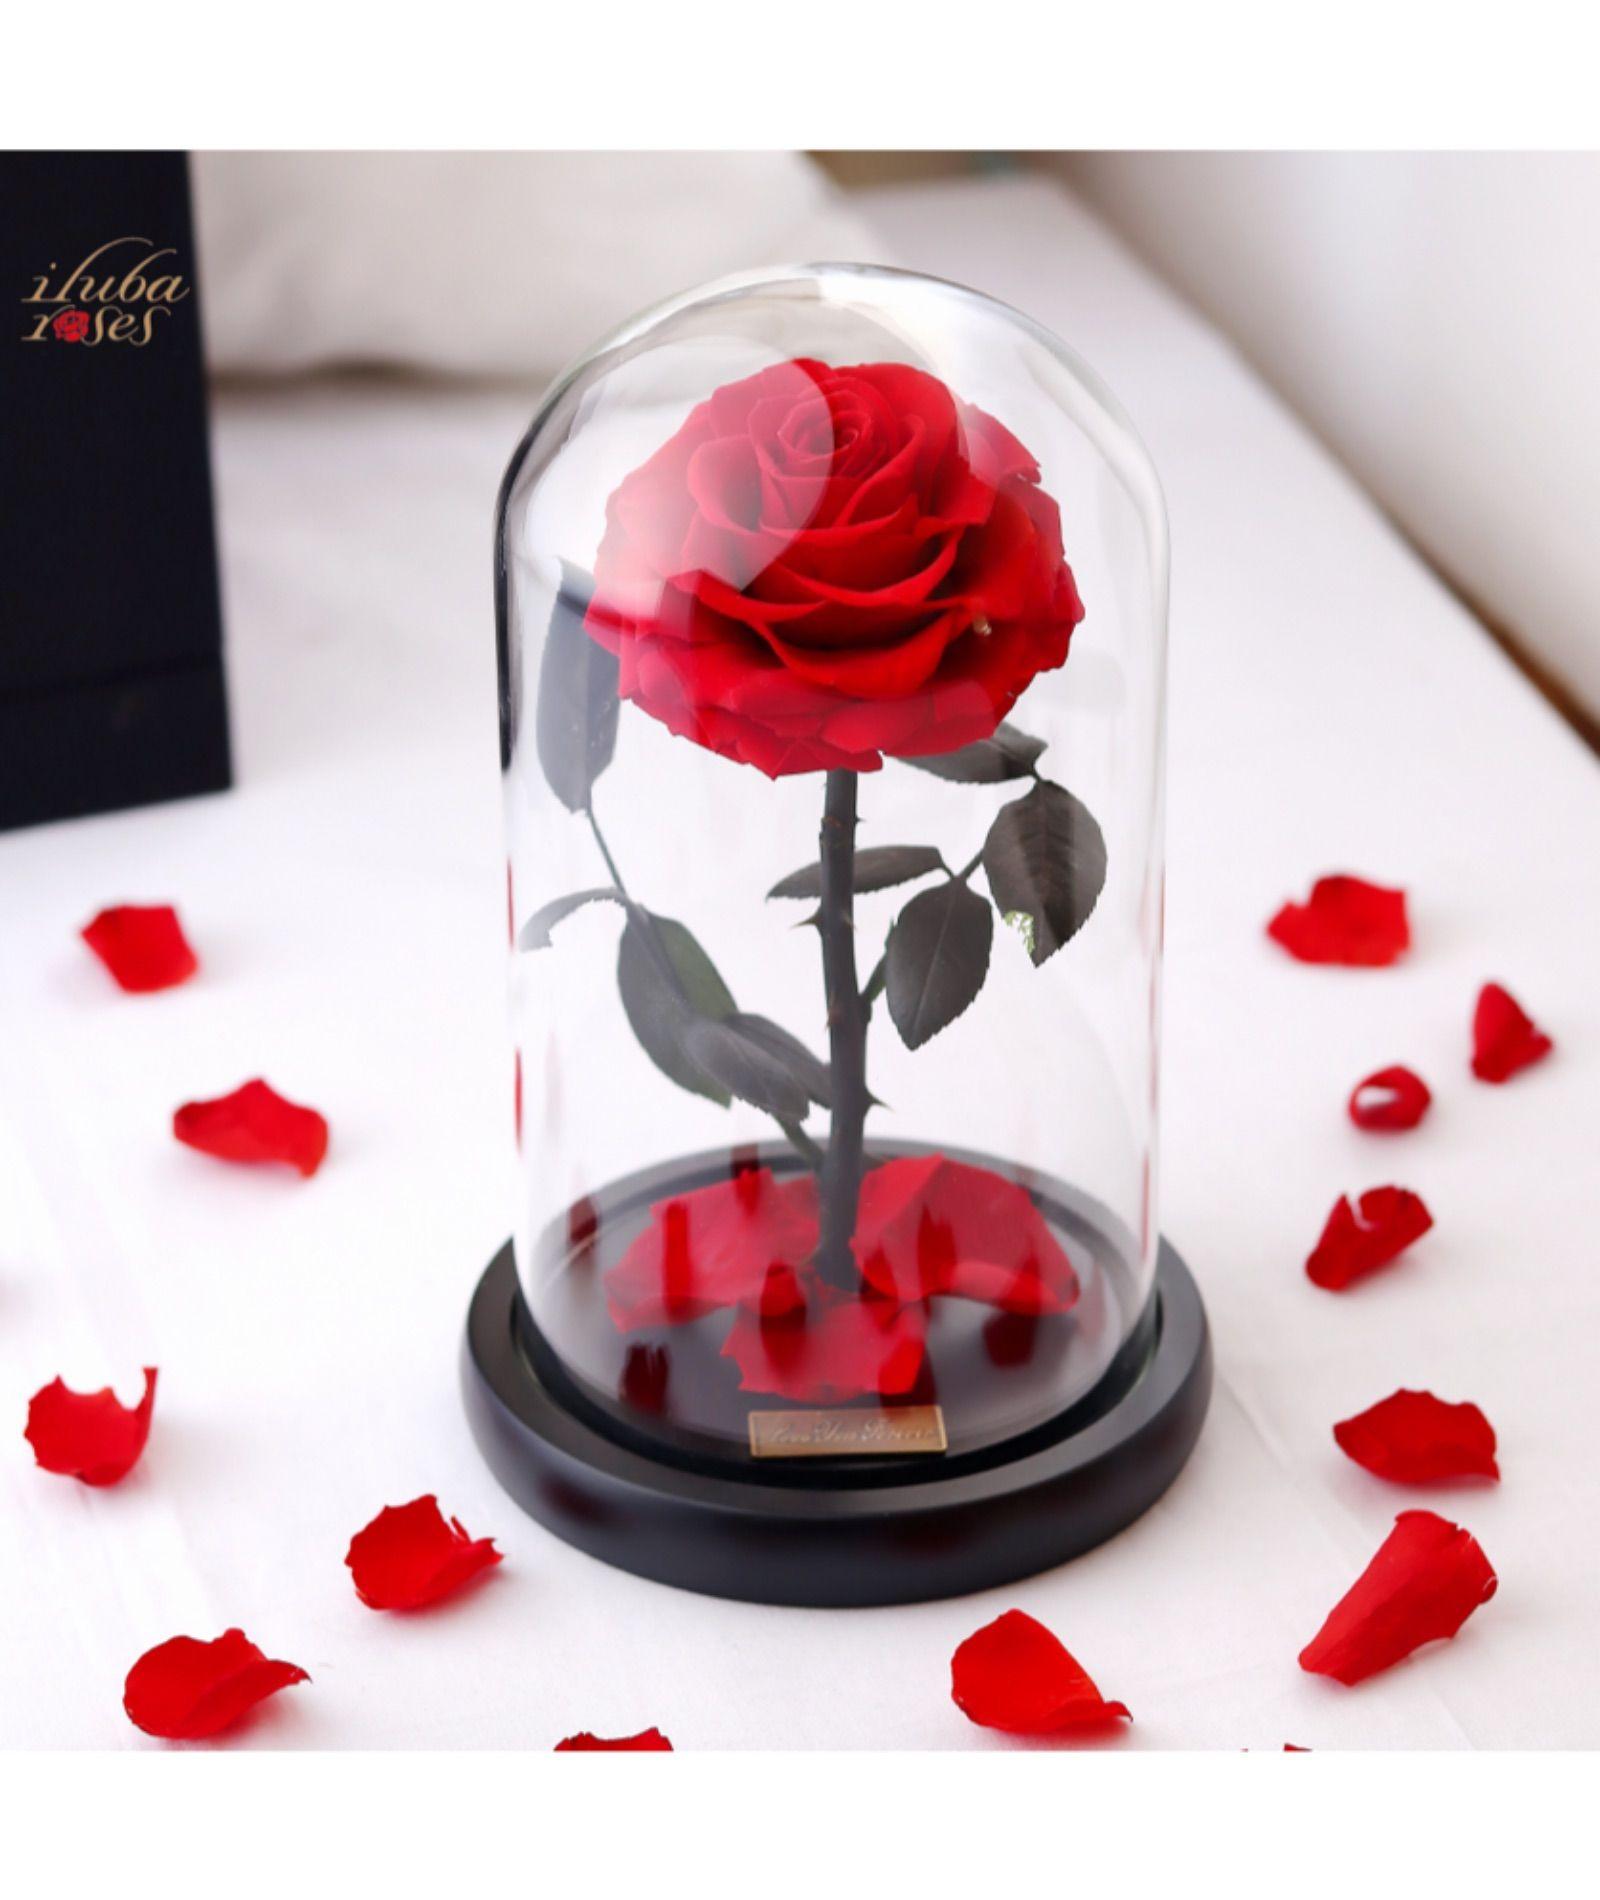 وردة ايلوبا روز احمر داخل فازة زجاجية Beauty And Beast Wedding Beauty And The Beast Rose